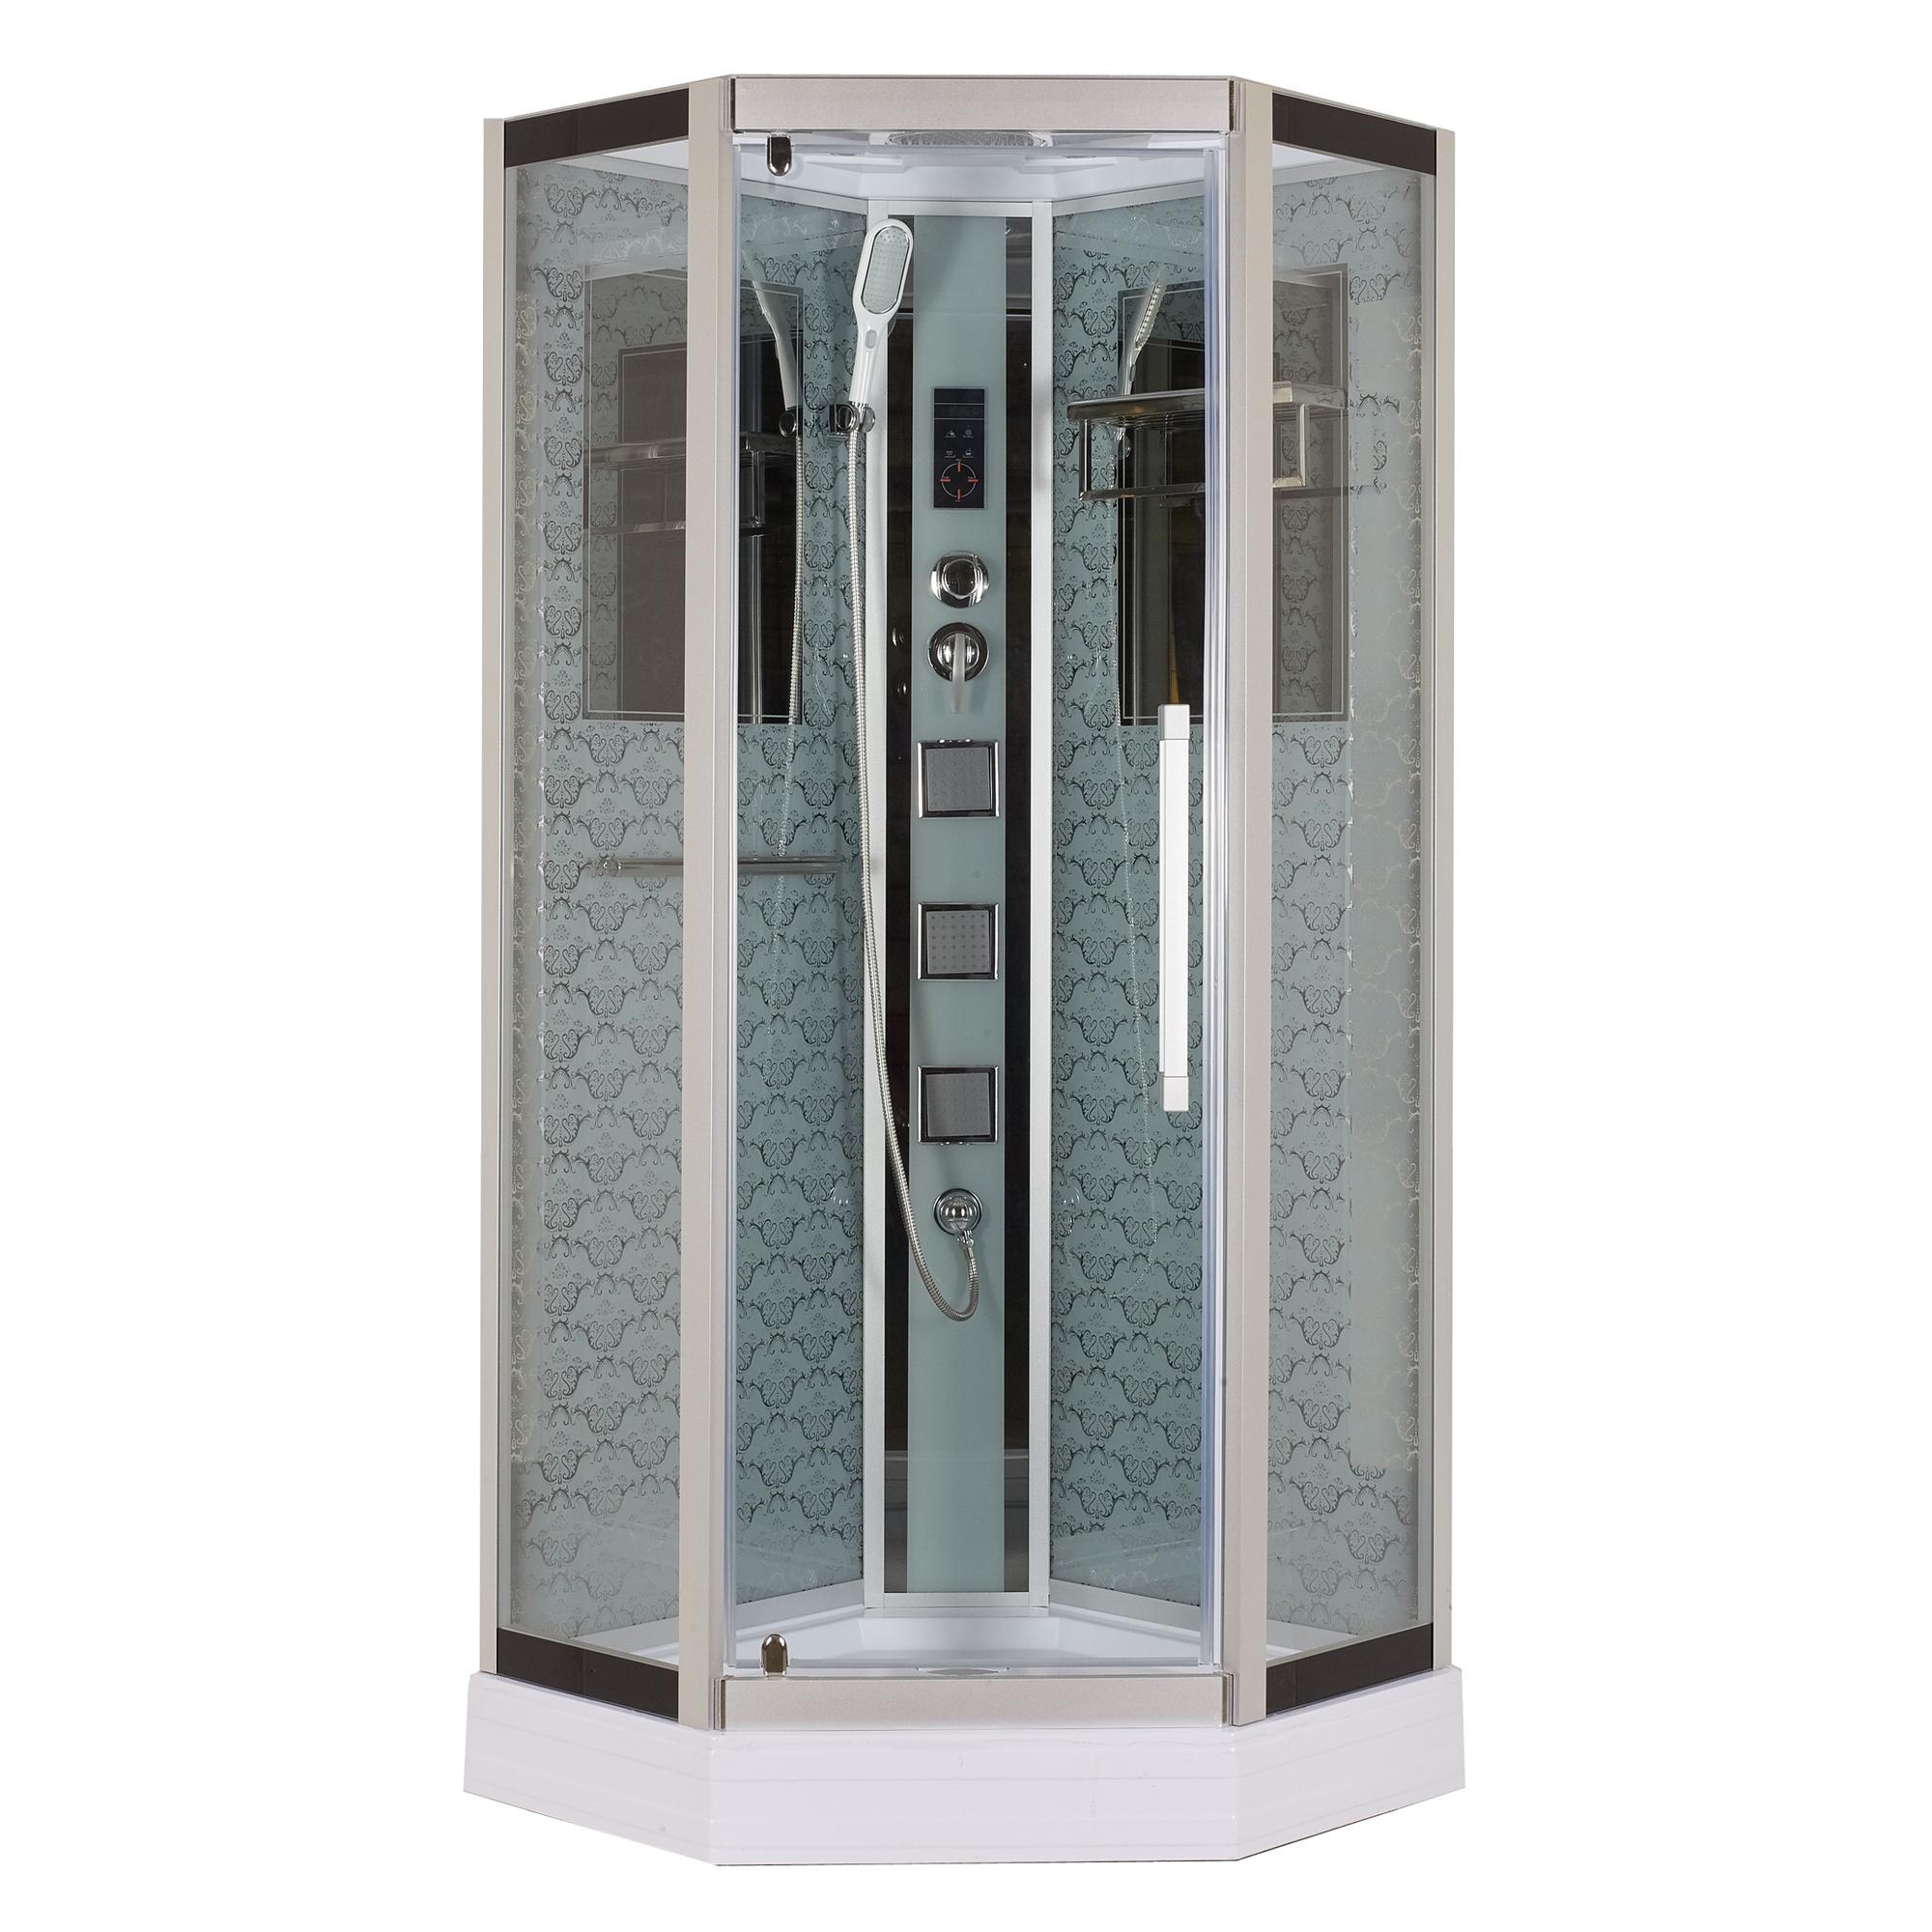 Душевая кабина Niagara Lux 7799W белый душевая кабина mirwell 120x80x215 см mr4512tpl c1